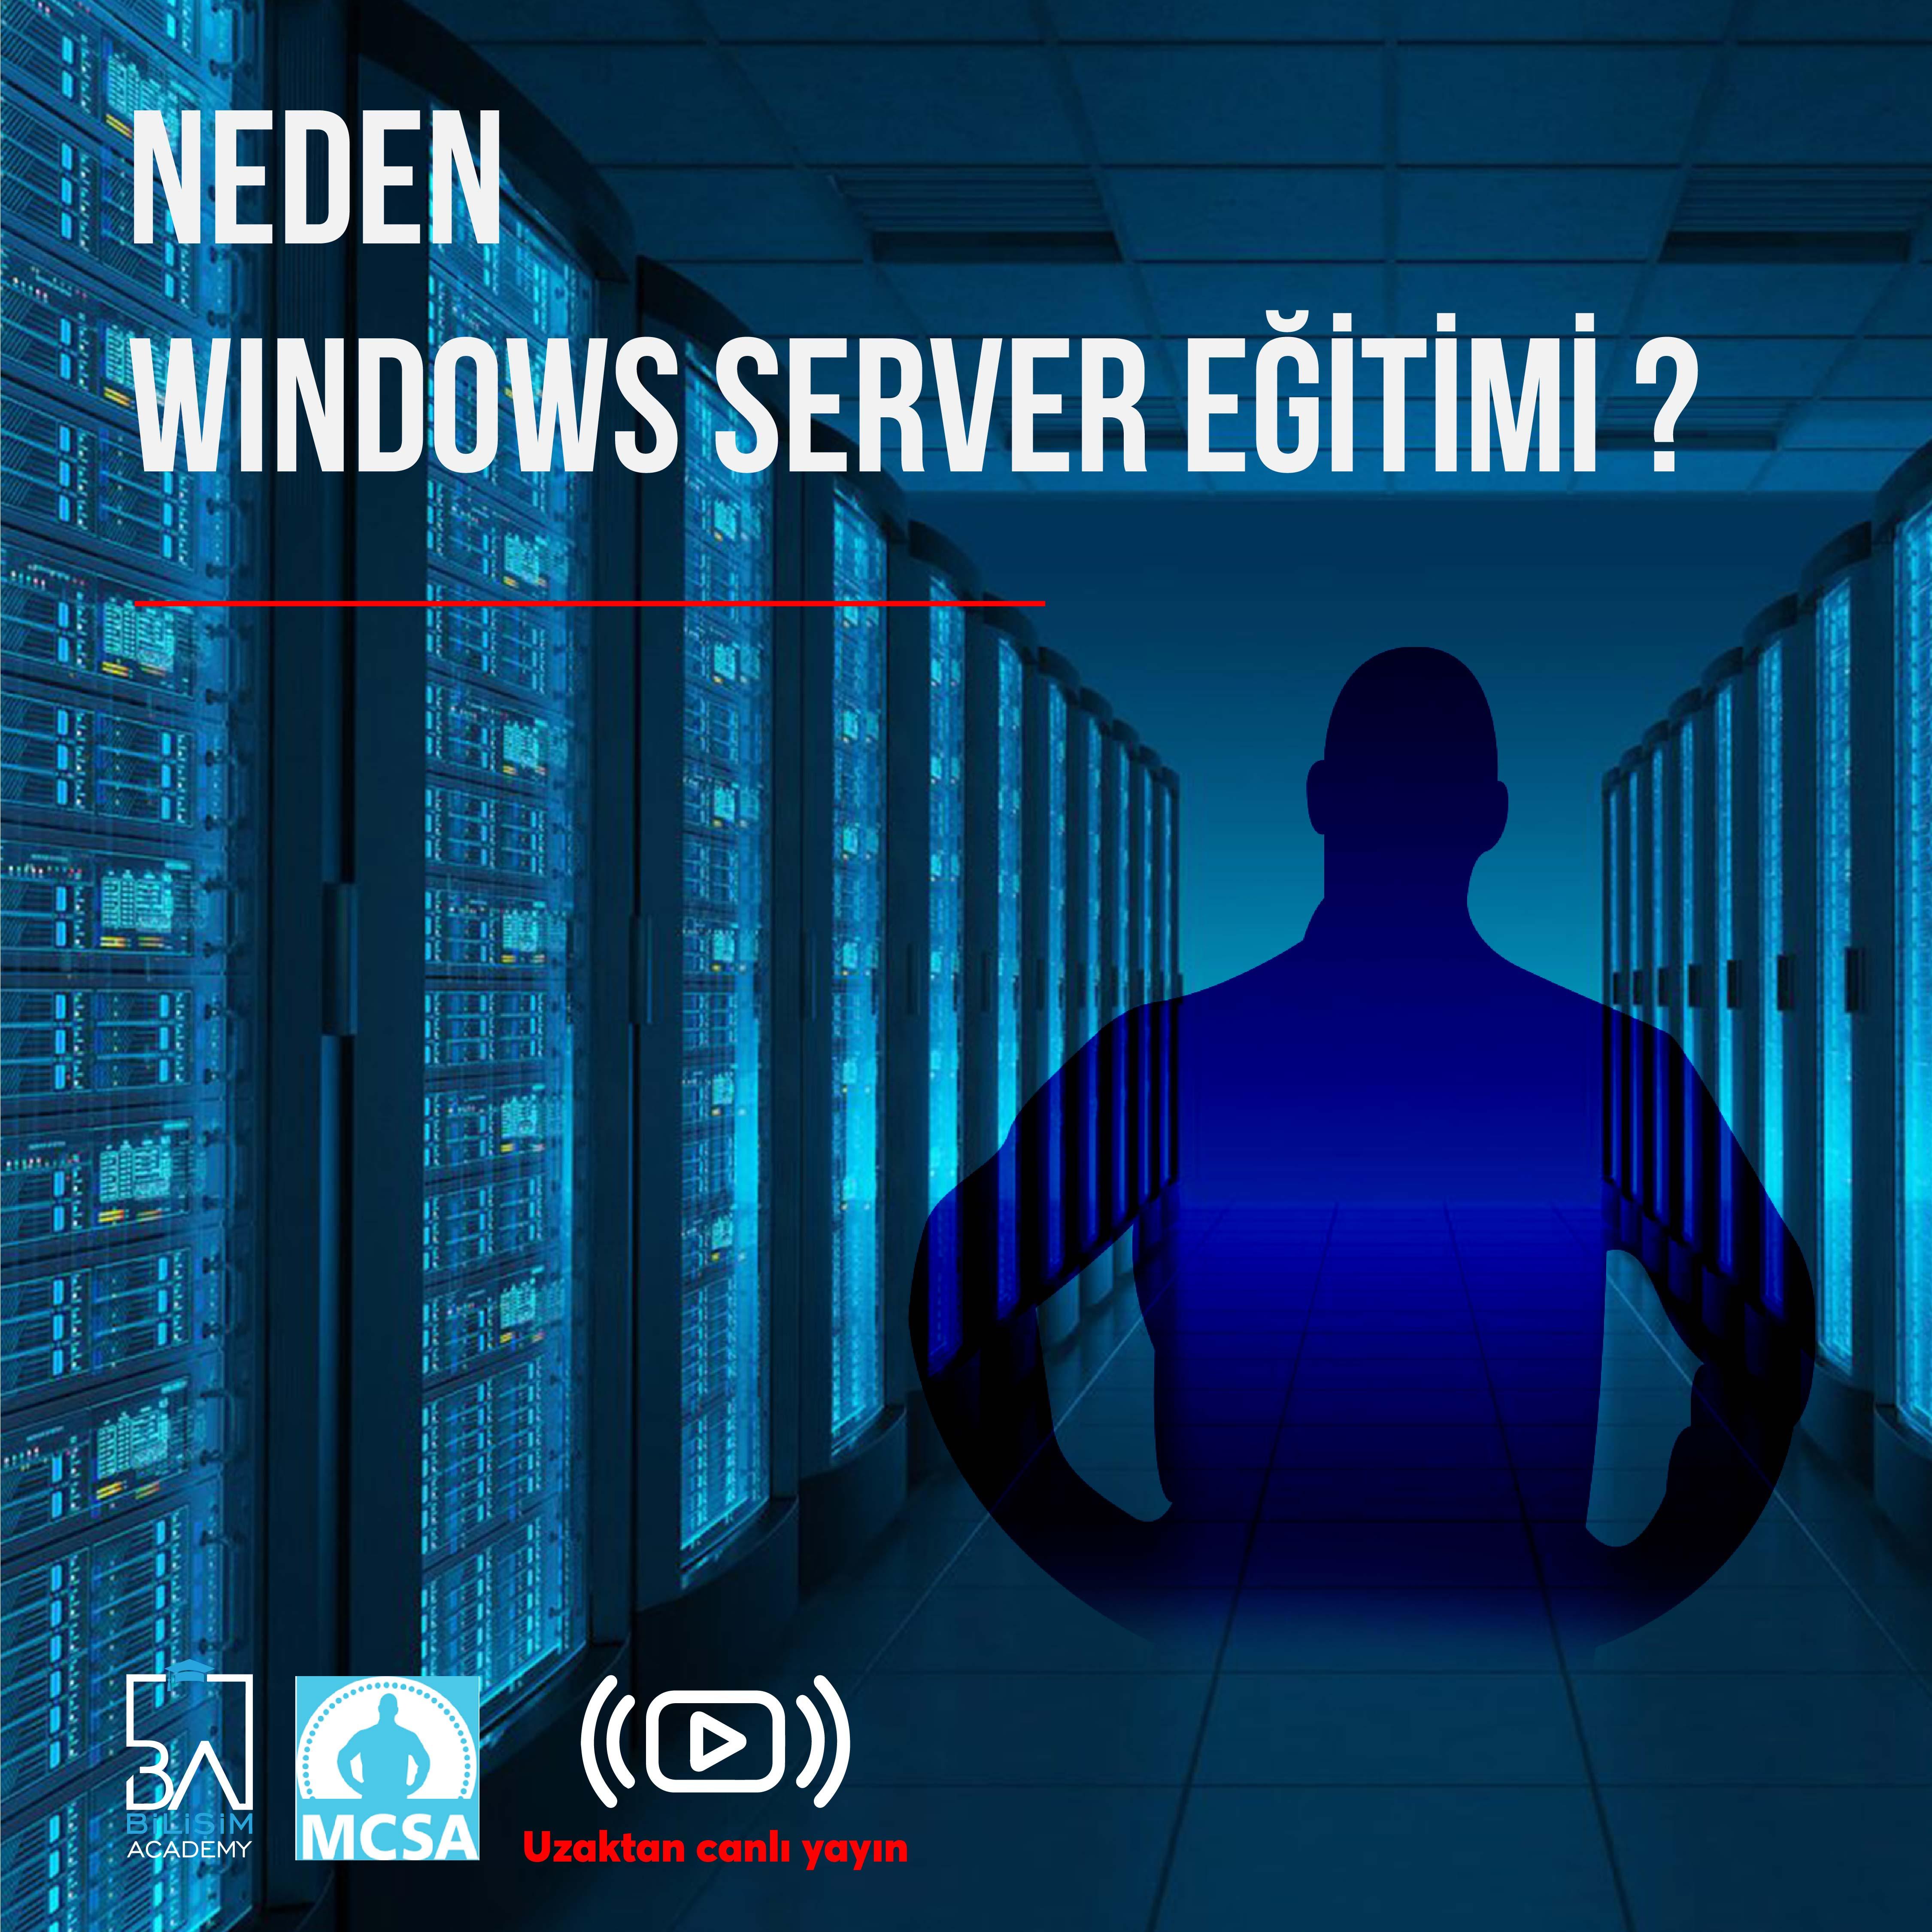 Microsoft Windows Server 2019 - Tanıtım